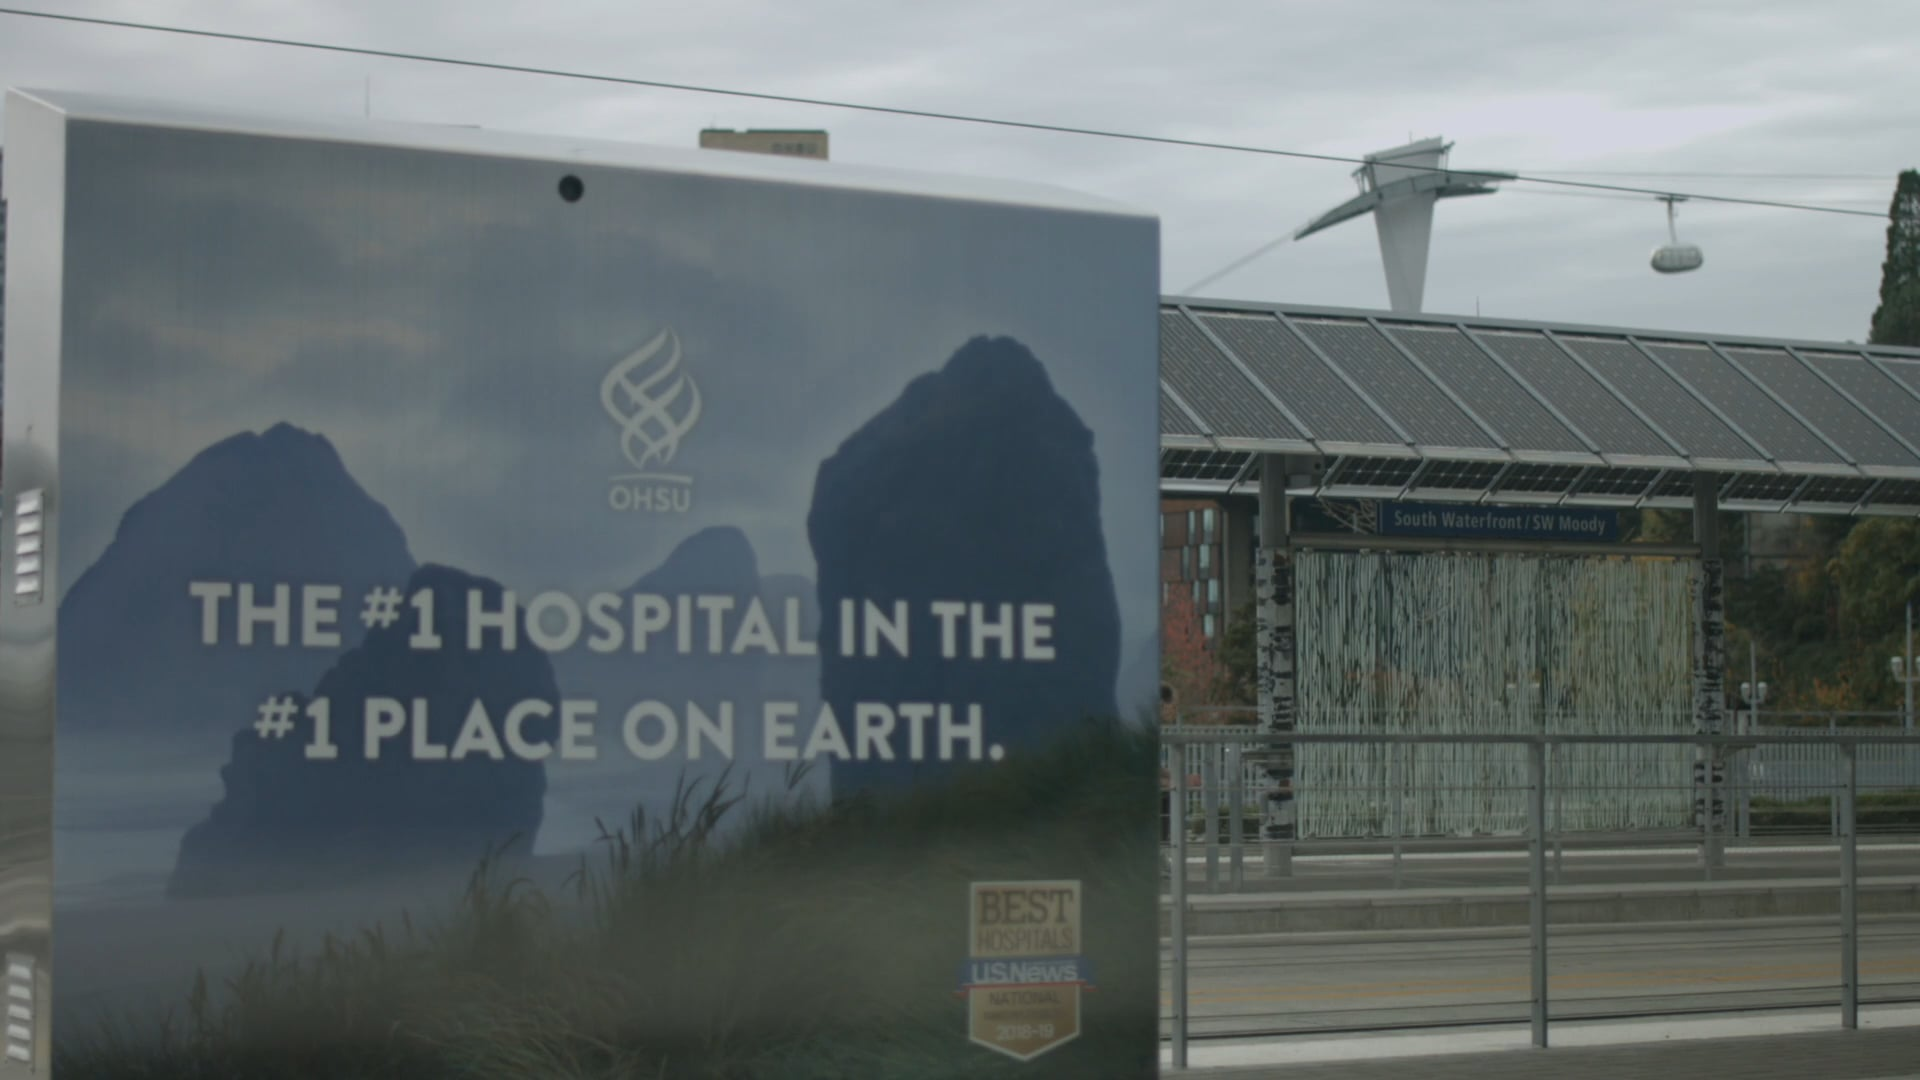 Oregon Health Sciences University (OHSU) Relational Leadership Institute (RLI) Promo, for Primary Care Progress (PCP)